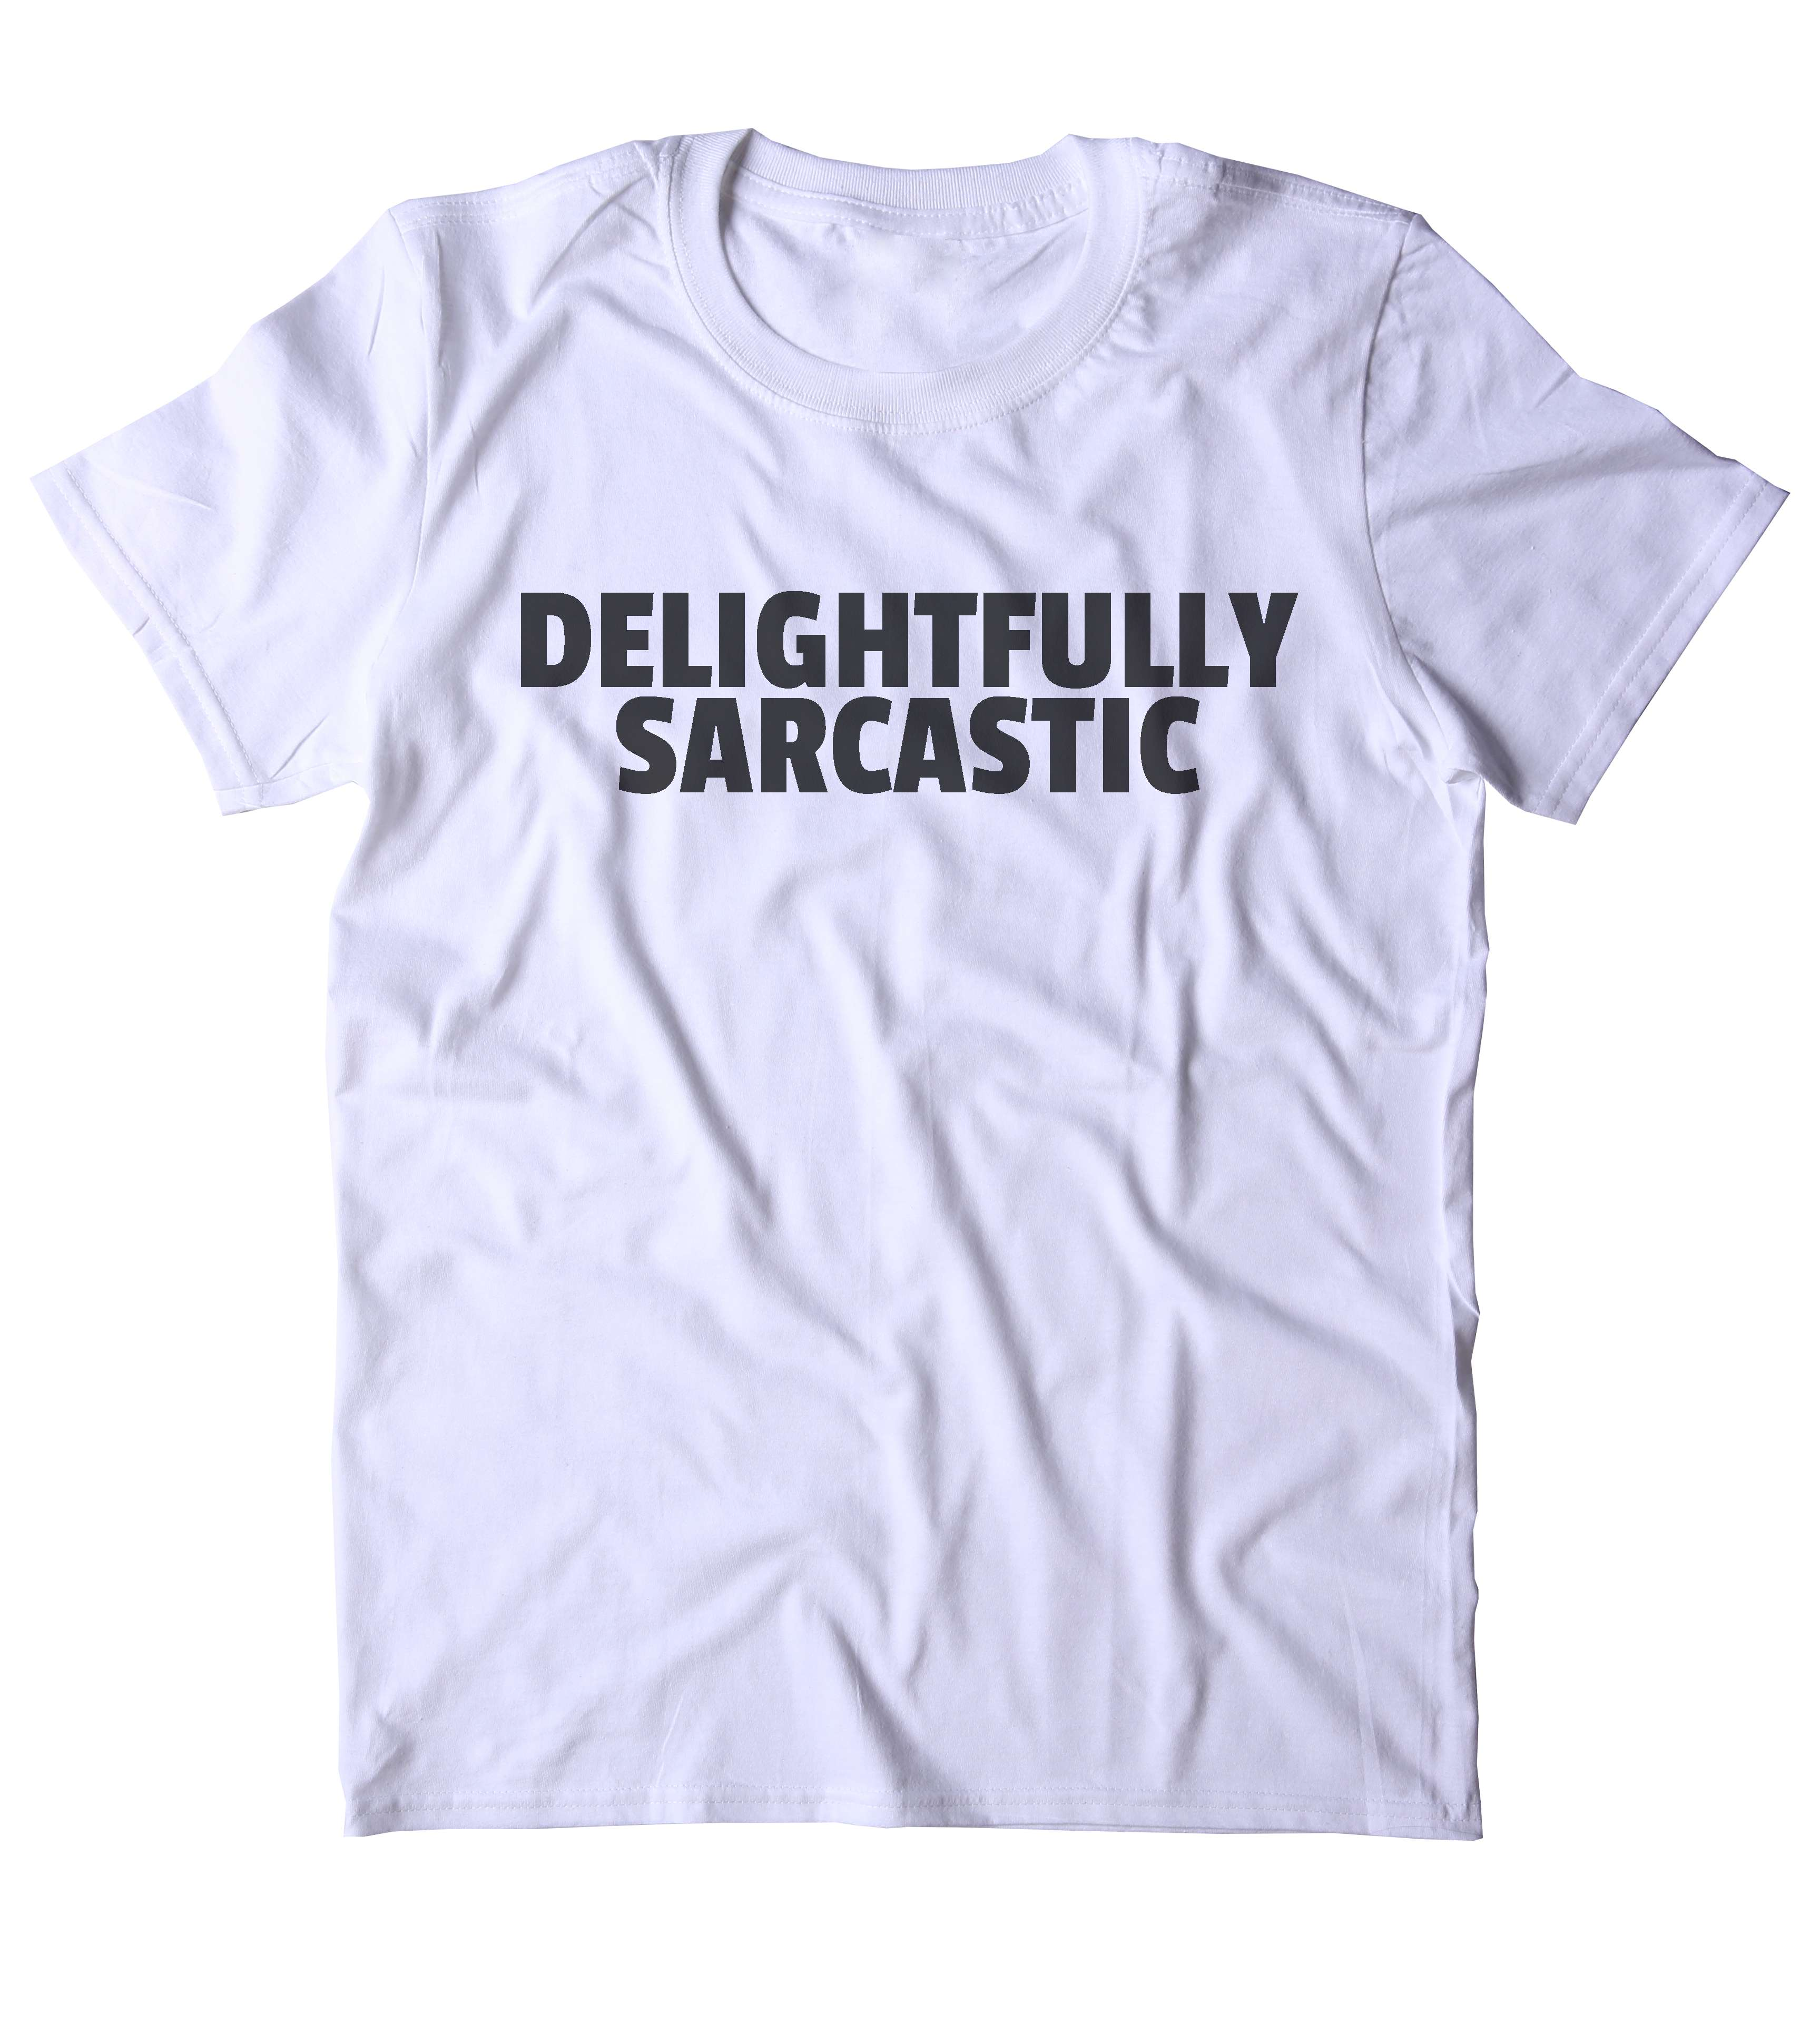 a2d48070 Delightfully Sarcastic T-Shirt Funny Sarcastic Anti Social Sarcasm Attitude  Clothing Tumblr Shirt